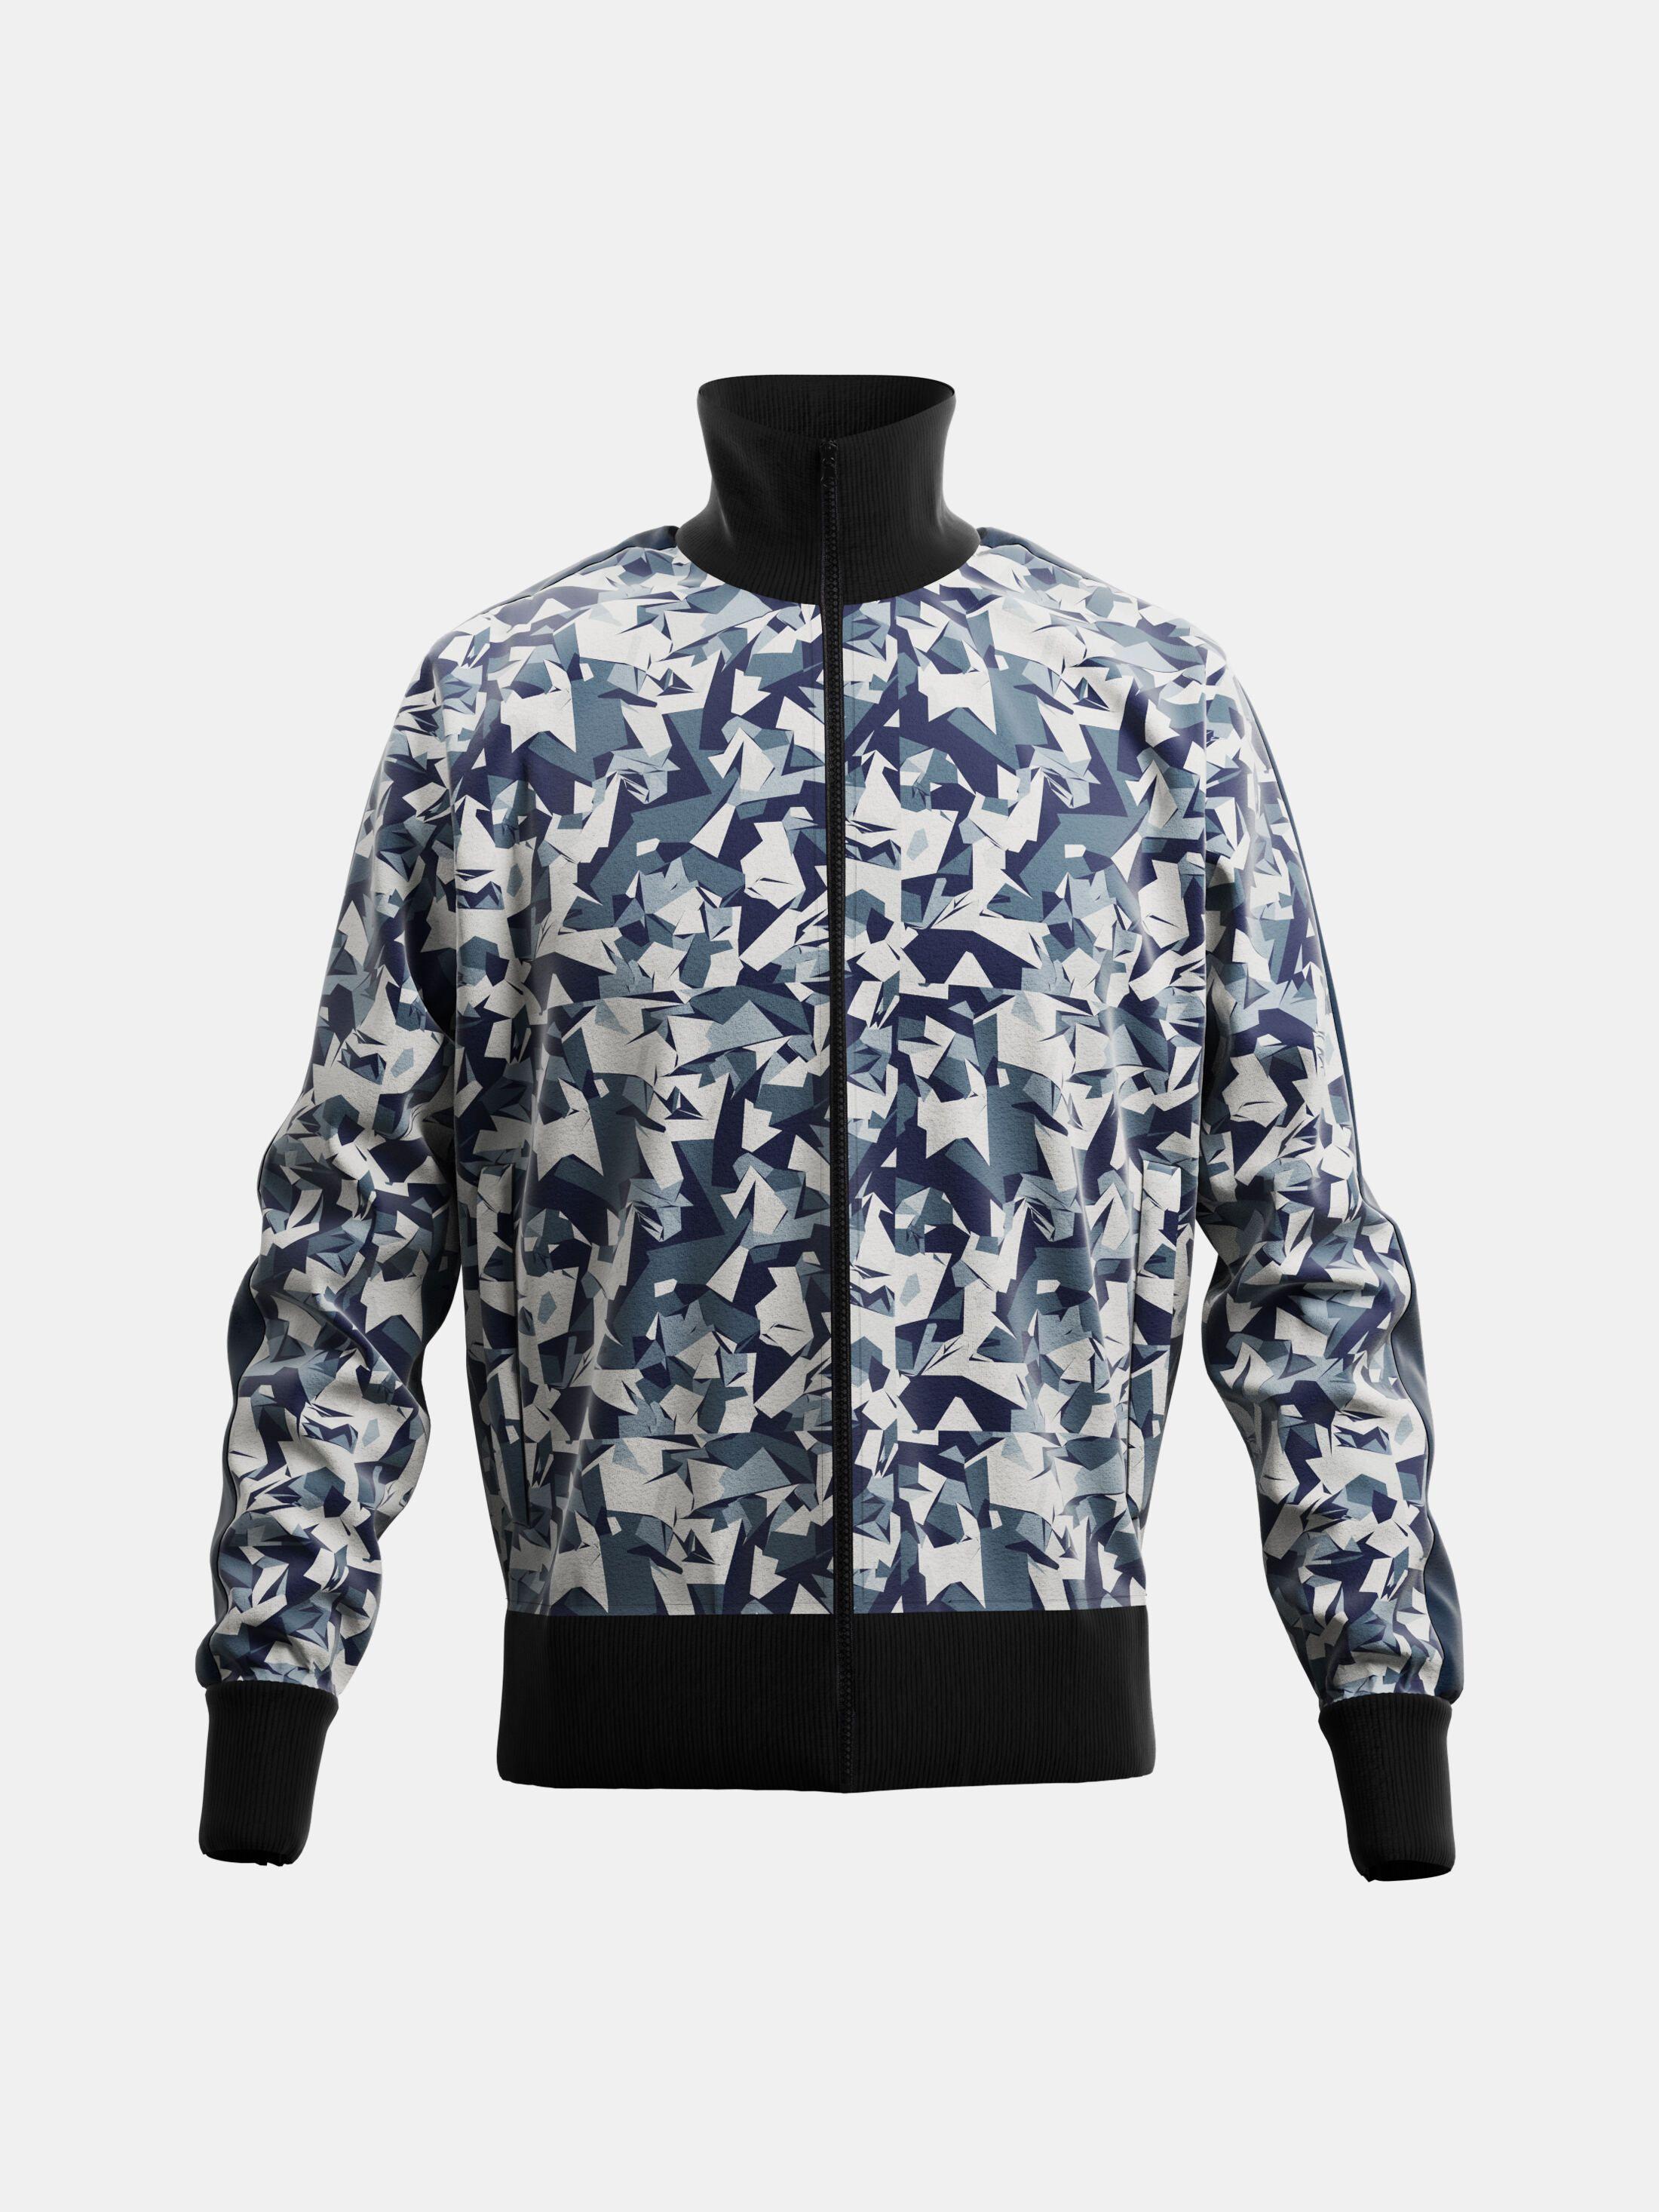 Custom Jogging Jacket & Pants